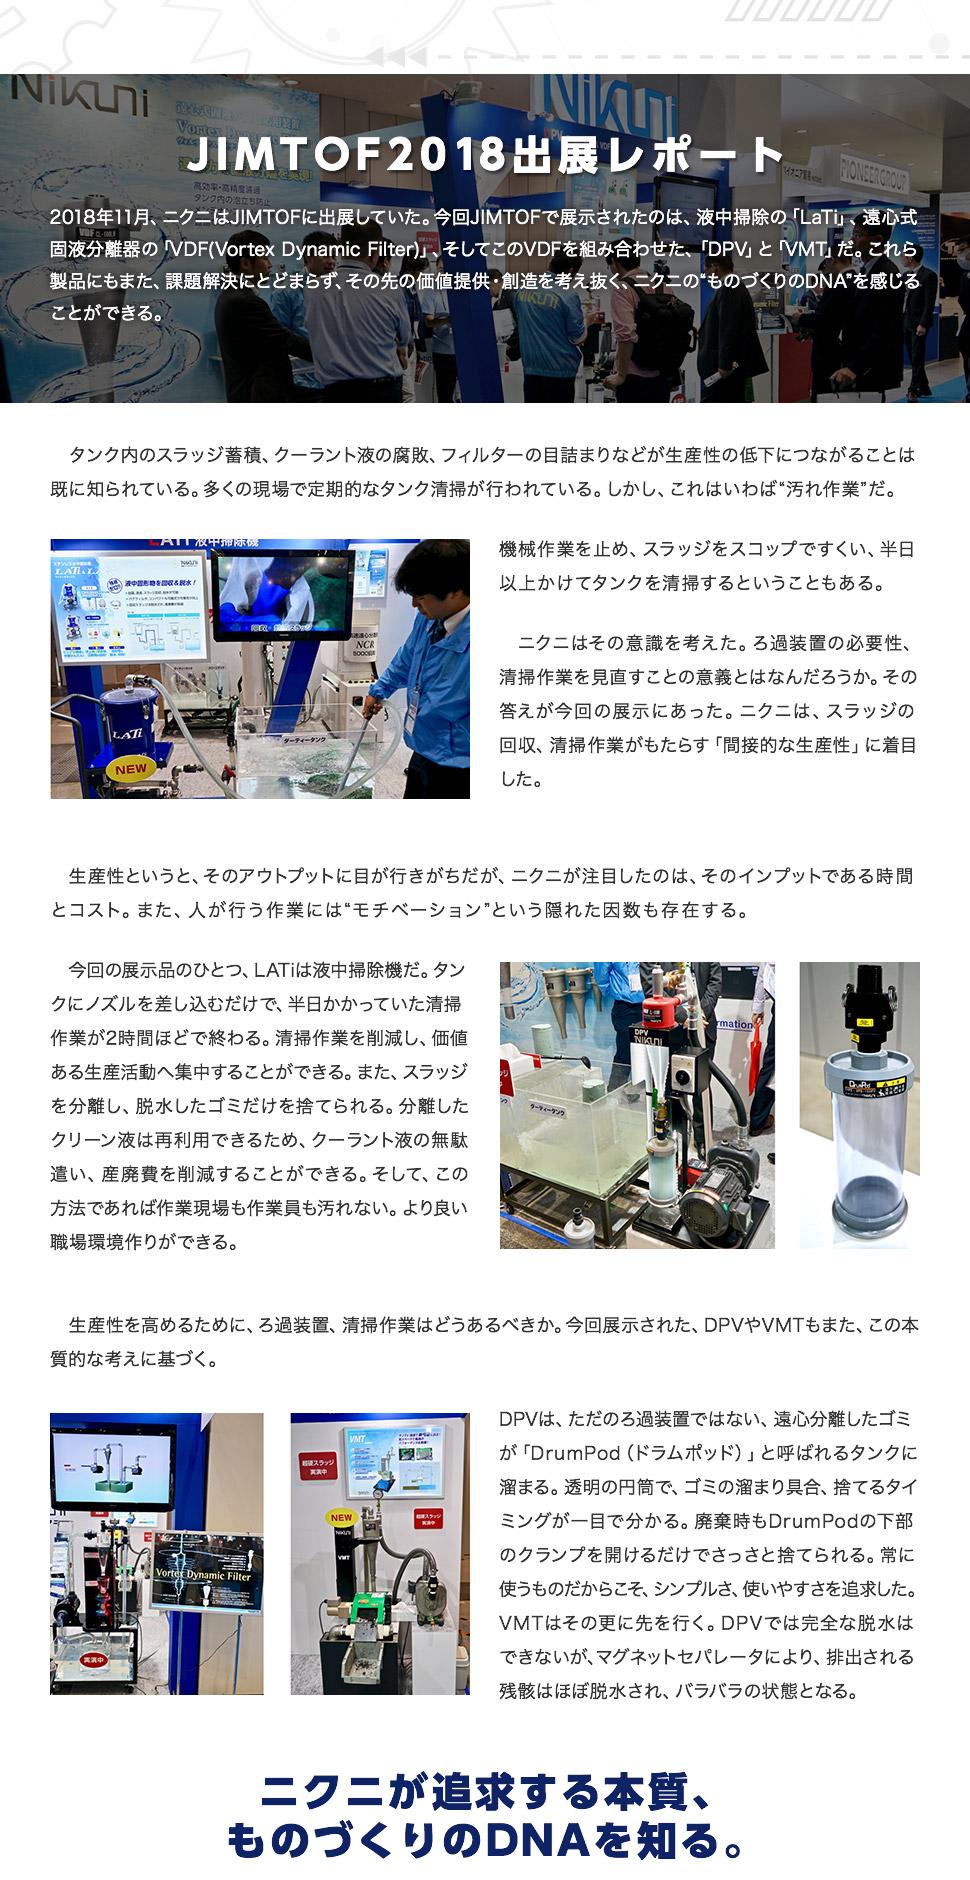 JIMTOF2018出展レポート